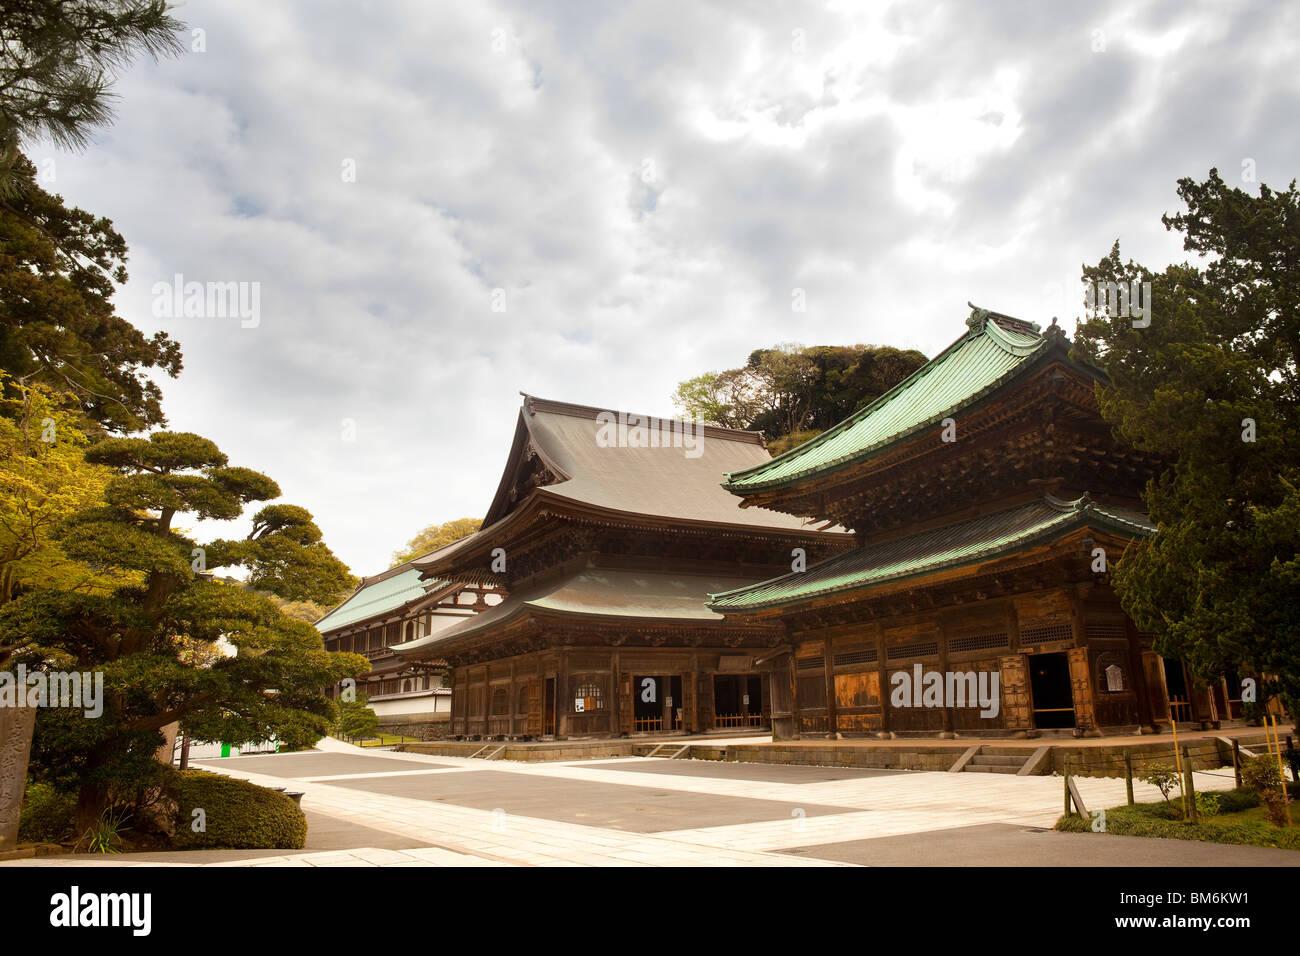 Kenchoji temple, Kamakura, Kanagawa Prefecture, Greater Tokyo Area, Japan - Stock Image